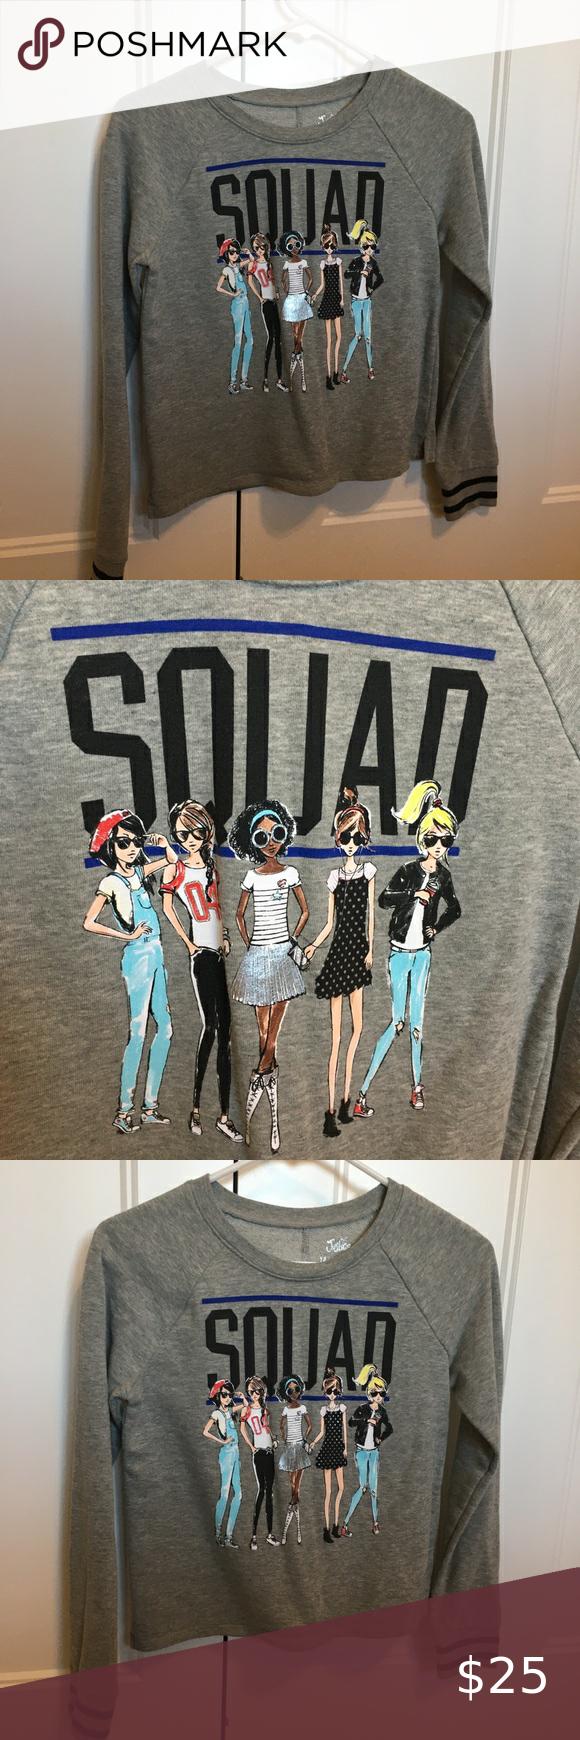 Girls Size 14 Justice Squad Sweatshirt Sweatshirts Size Girls Justice Shirts